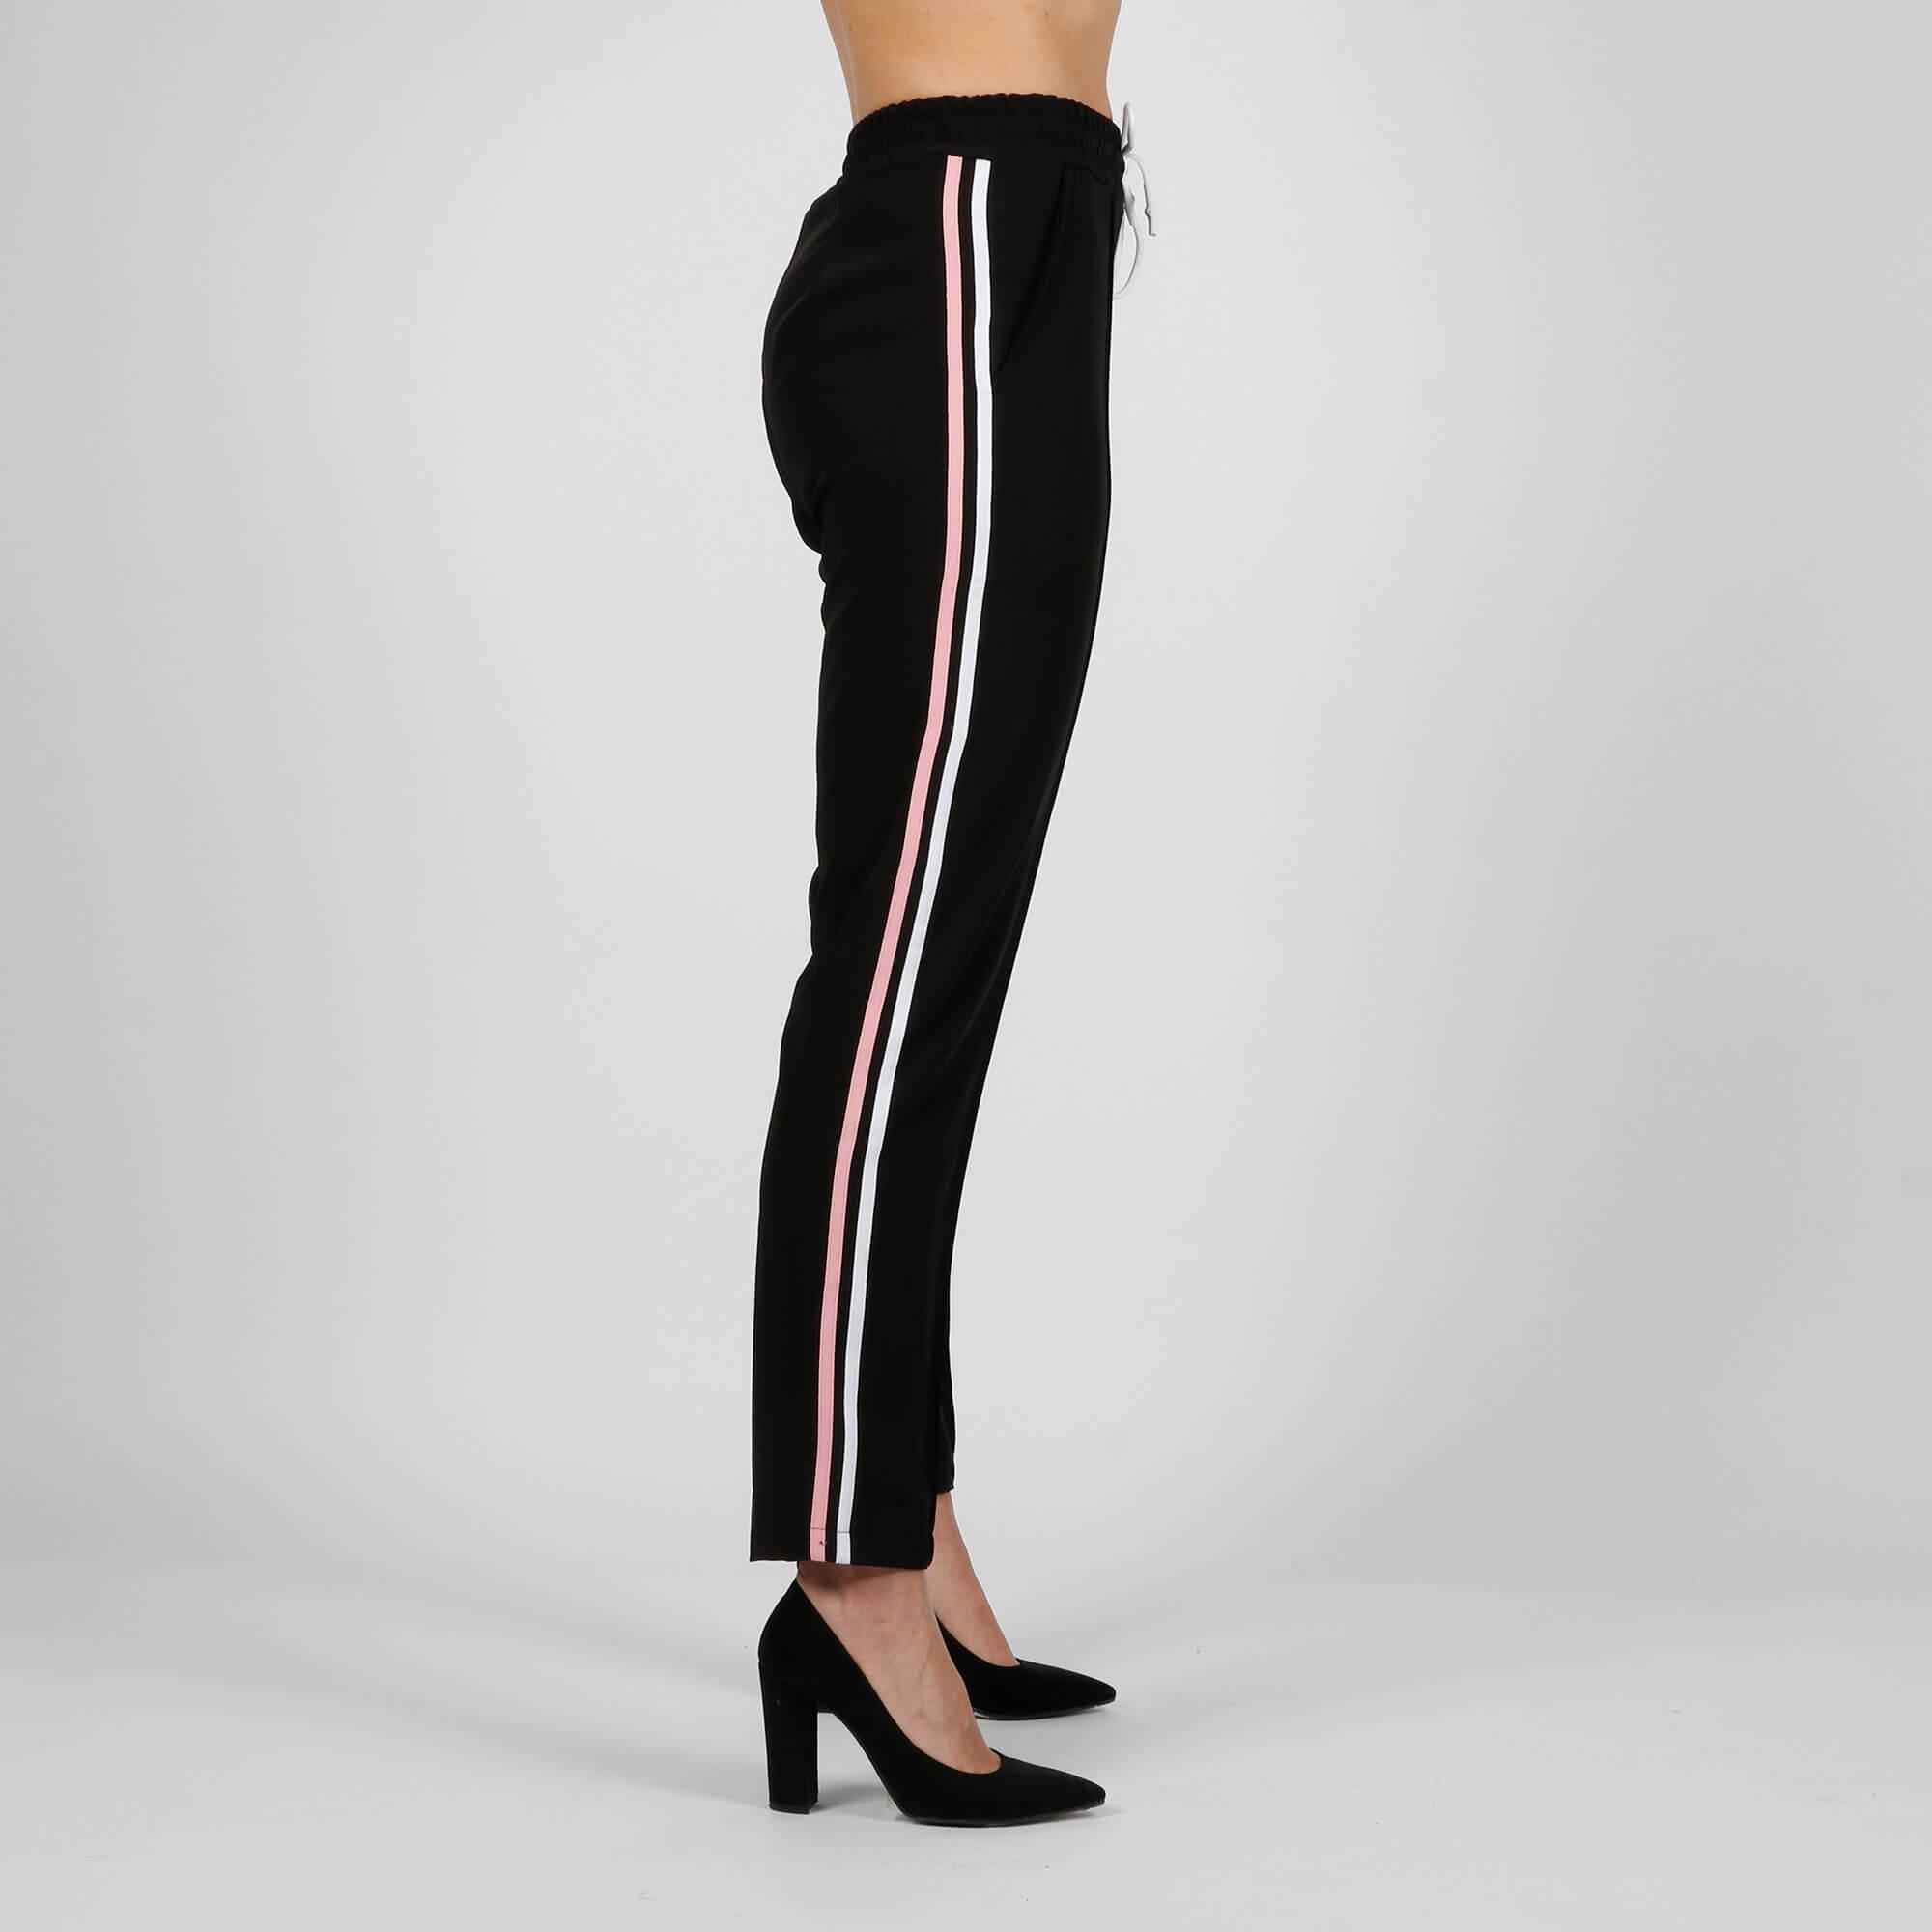 Pantalone tuta banda laterale - Nero